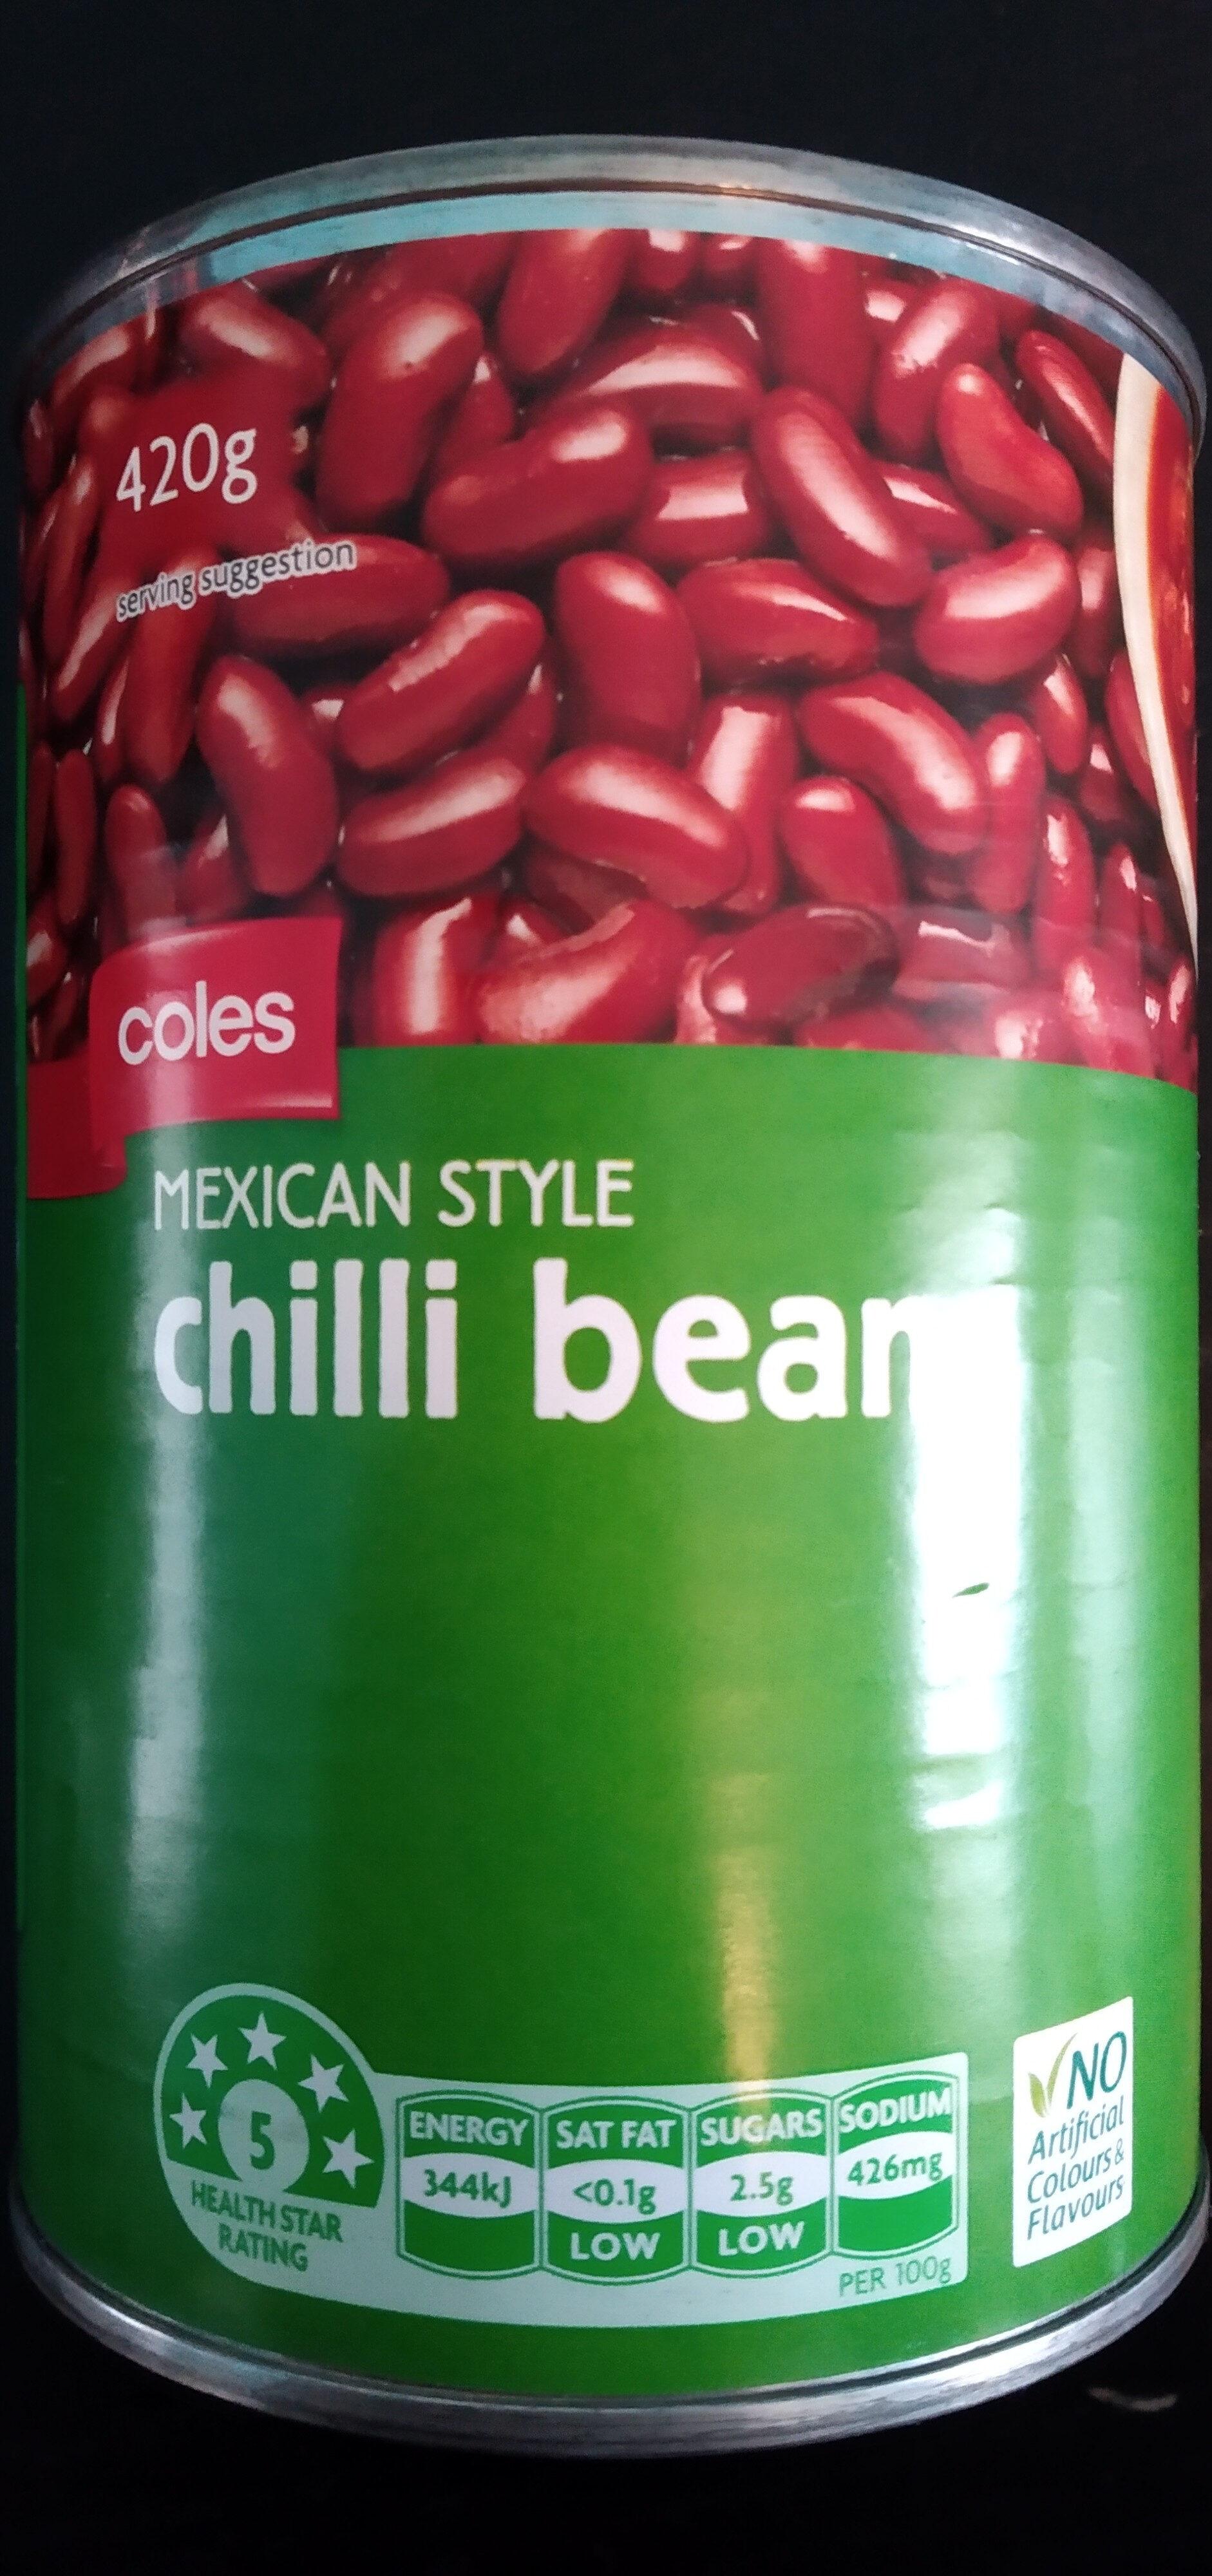 Mexican Style Chilli Beans - Prodotto - en